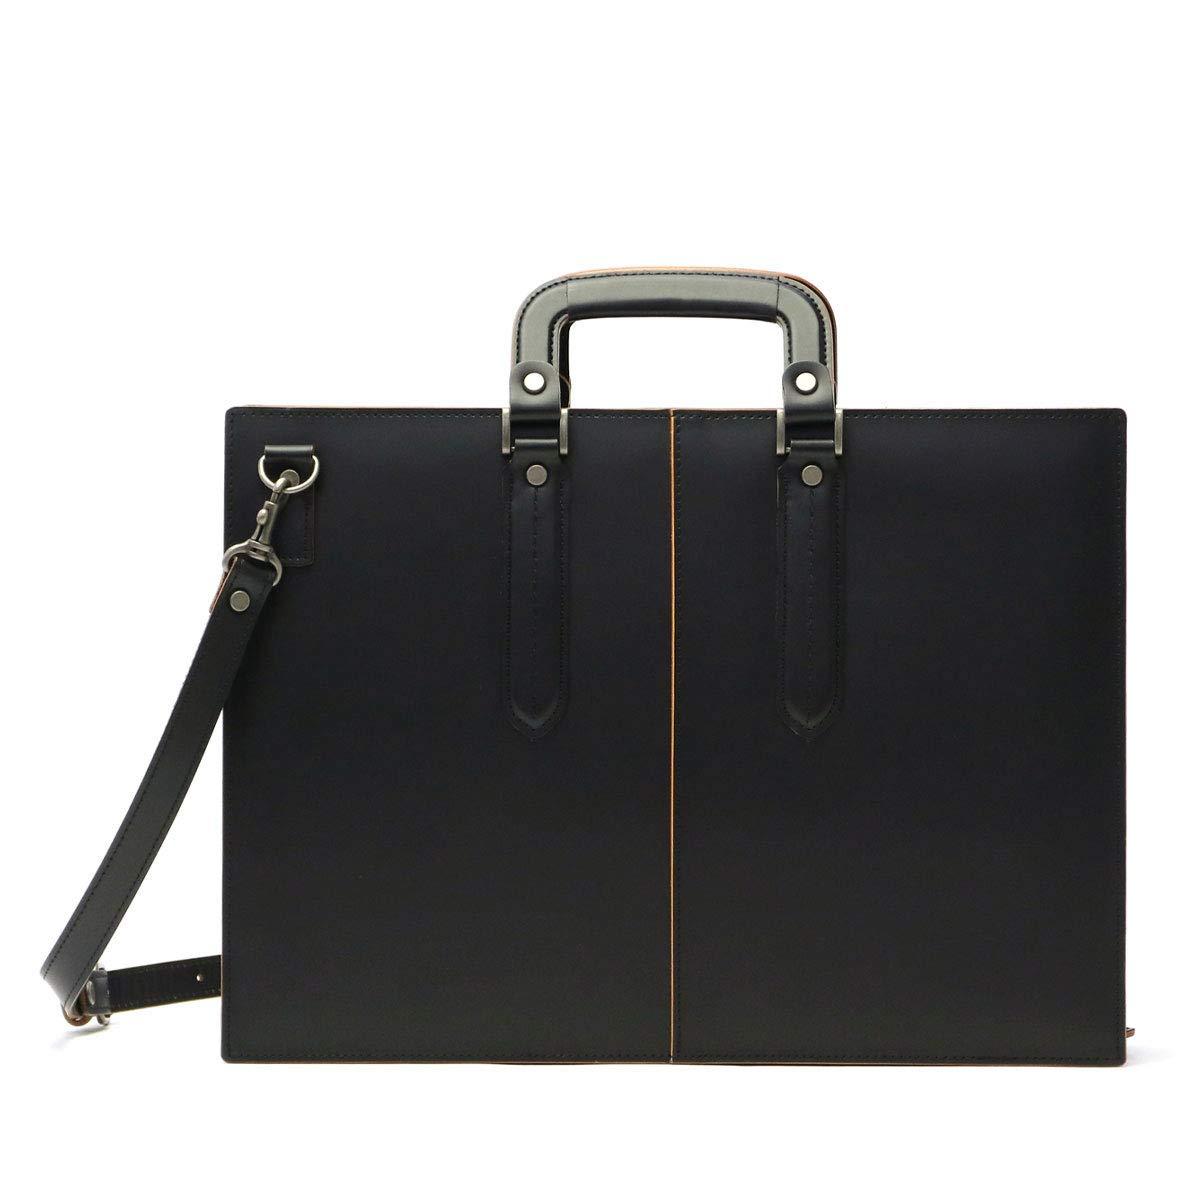 LuggageAOKI 青木鞄 COMPLEX-GARDENS コンプレックスガーデンズ 枯淡 ビジネス ブリーフケース 広マチ Mサイズ 日本製 本革 ブラック 3703-10 B004ATRQHM